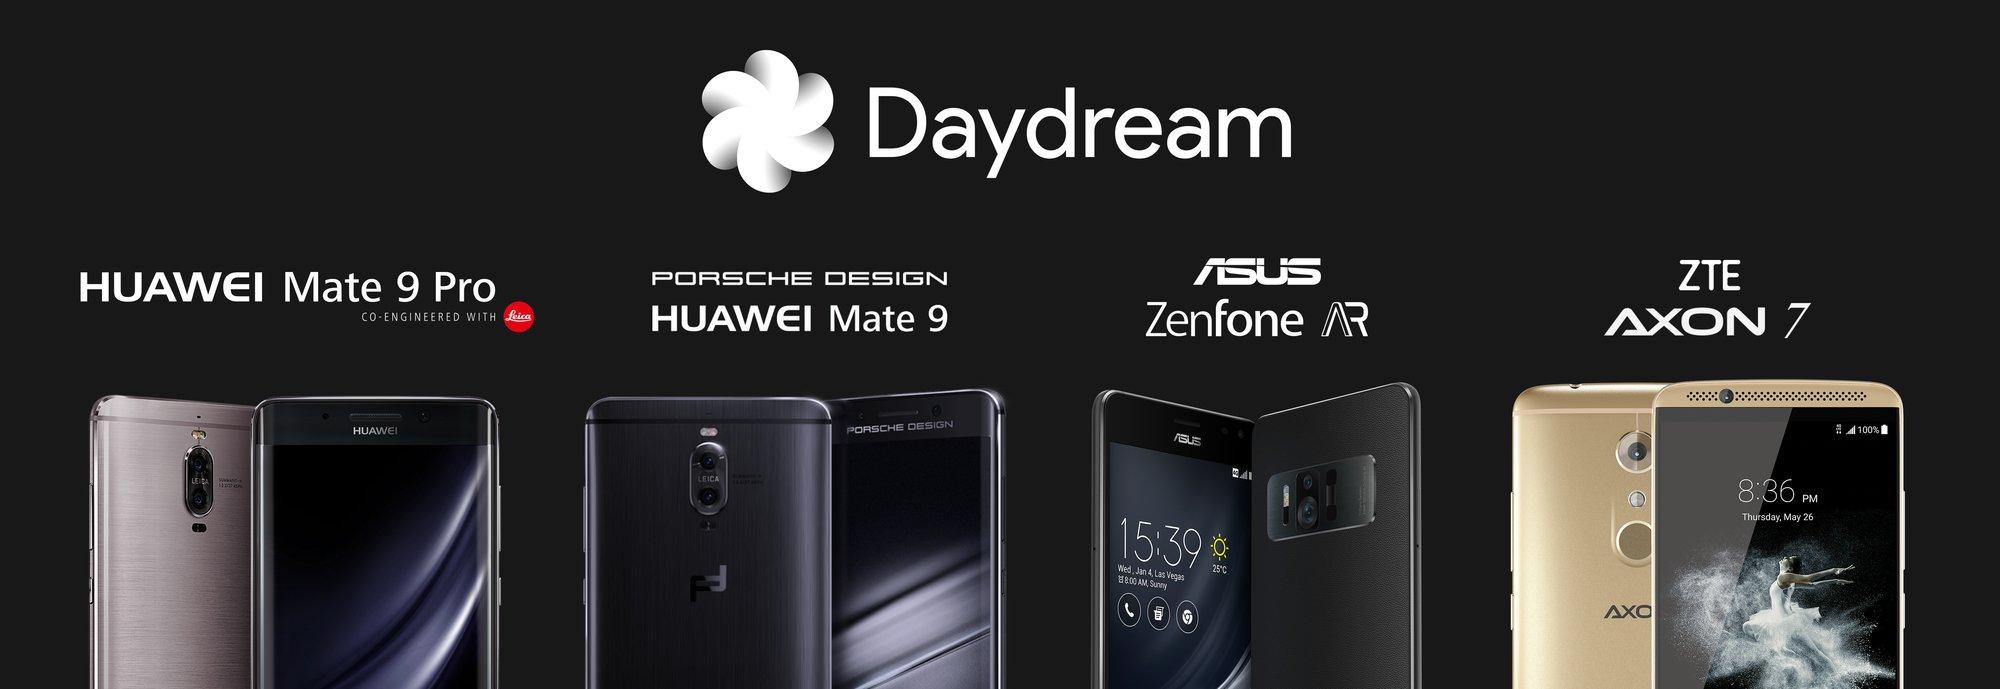 daydream-phones